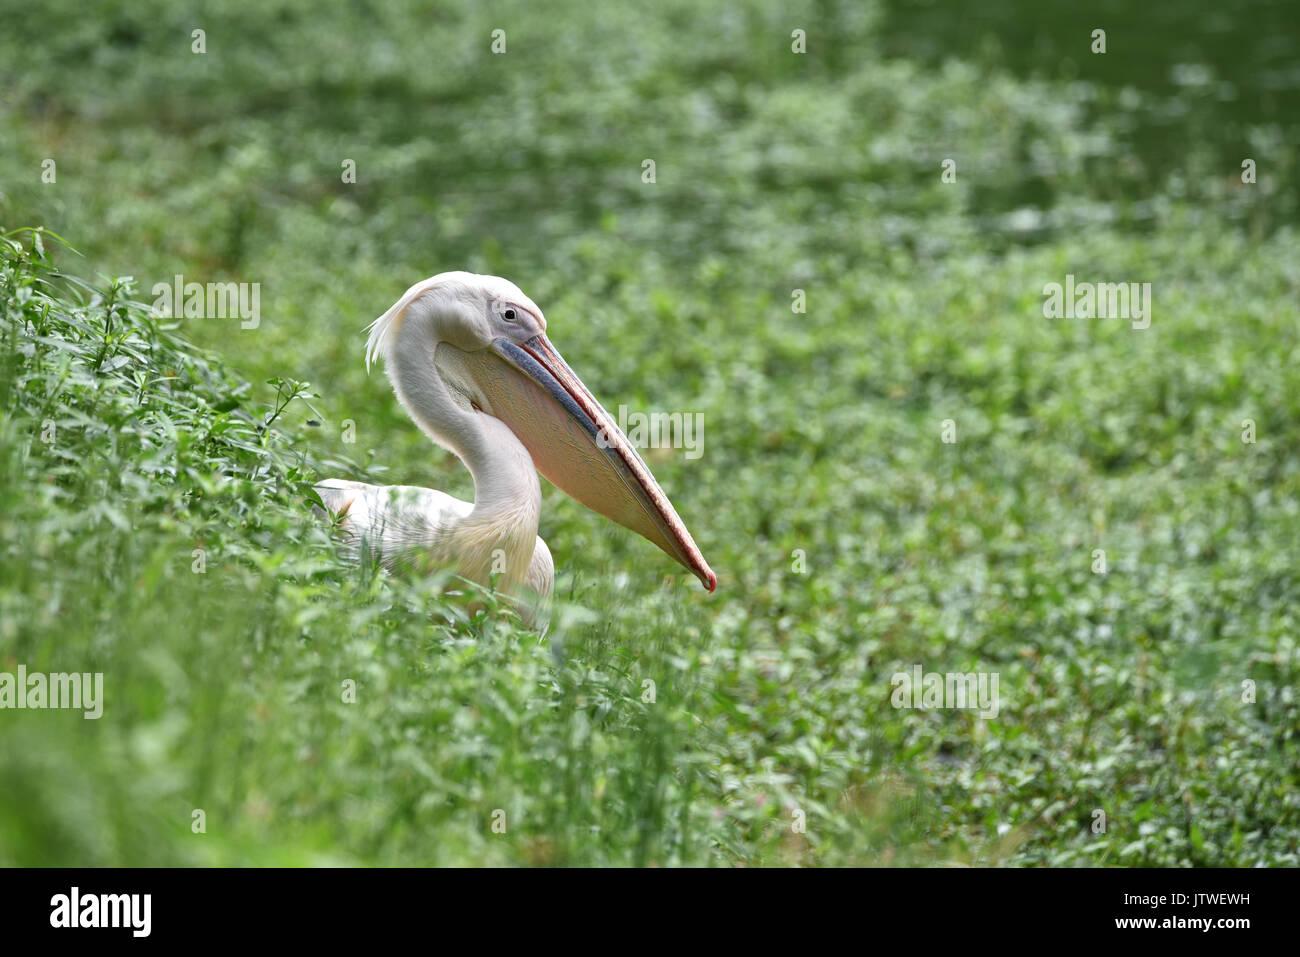 white pelican (Pelecanus erythrorhynchos) hiding in the grass field - Stock Image